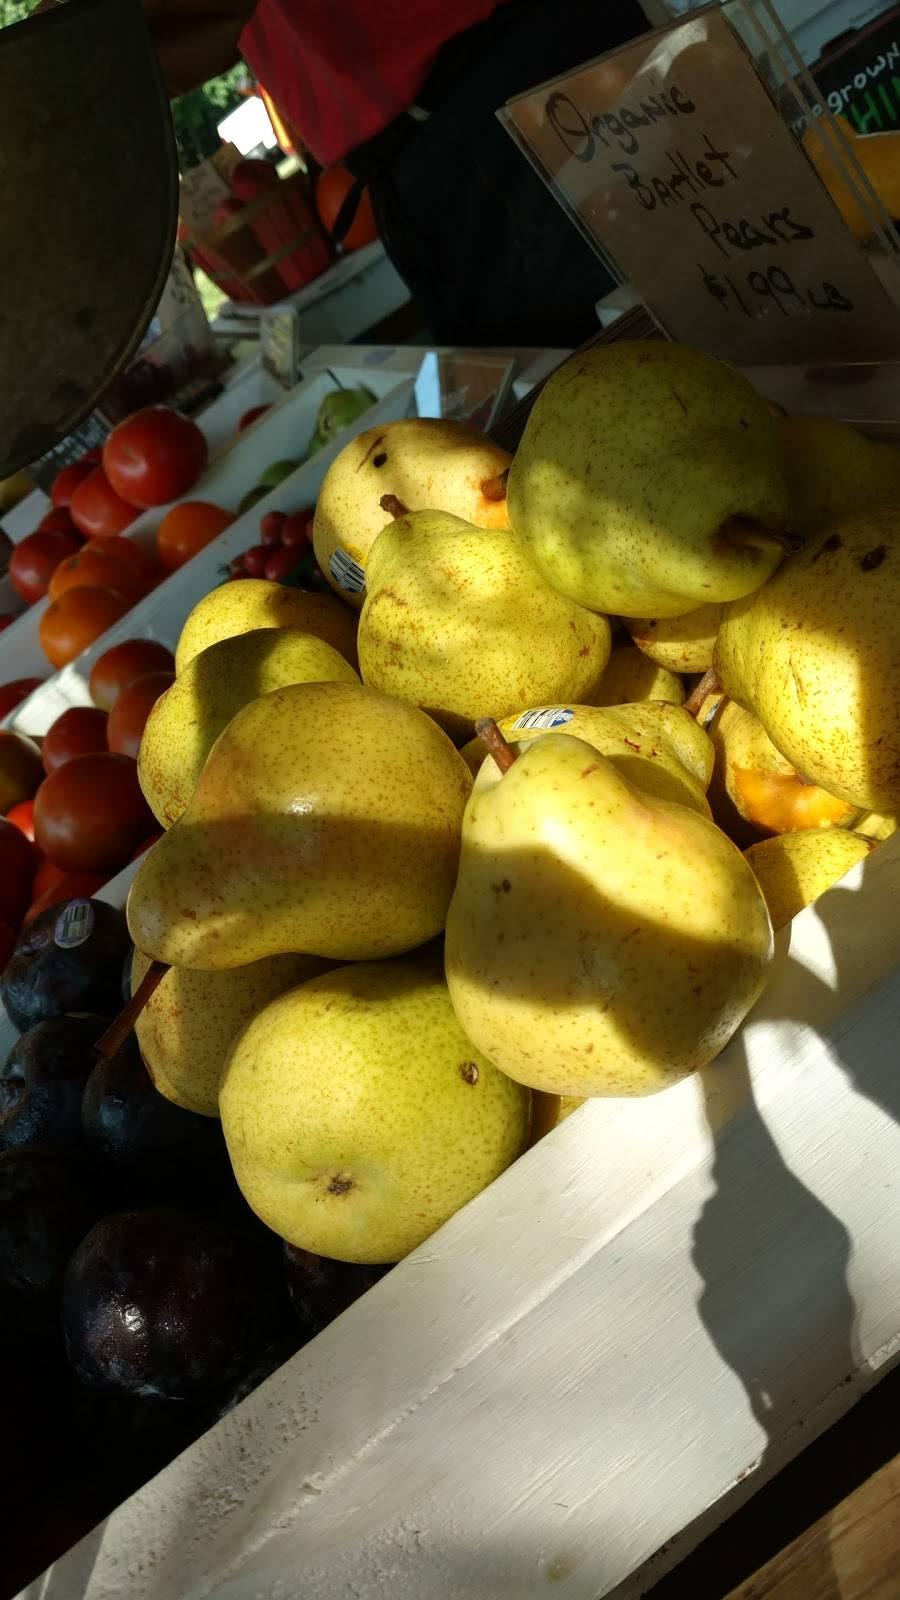 The Citrus Tree - home goods store  | Photo 5 of 8 | Address: 10031 Corbett Rd, Cincinnati, OH 45231, USA | Phone: (513) 313-3638